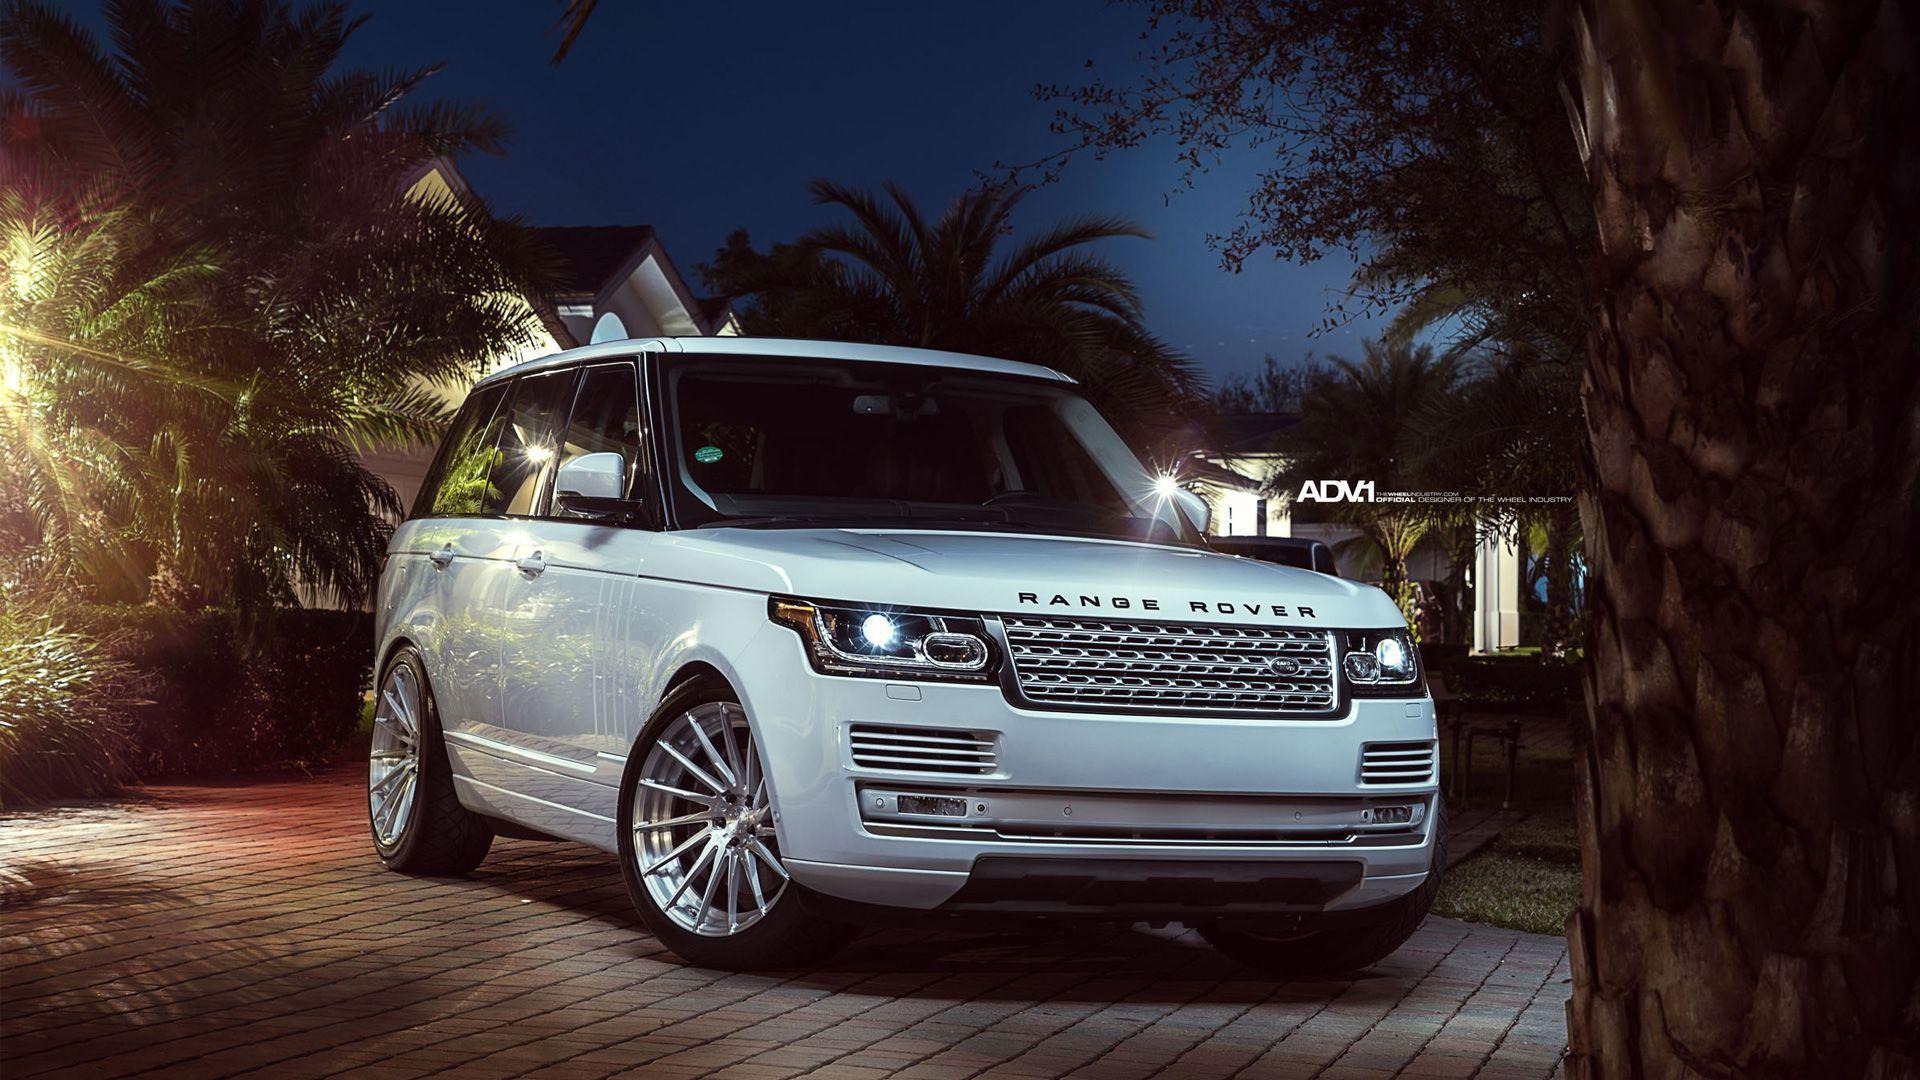 Range Rover Vogue Wallpapers